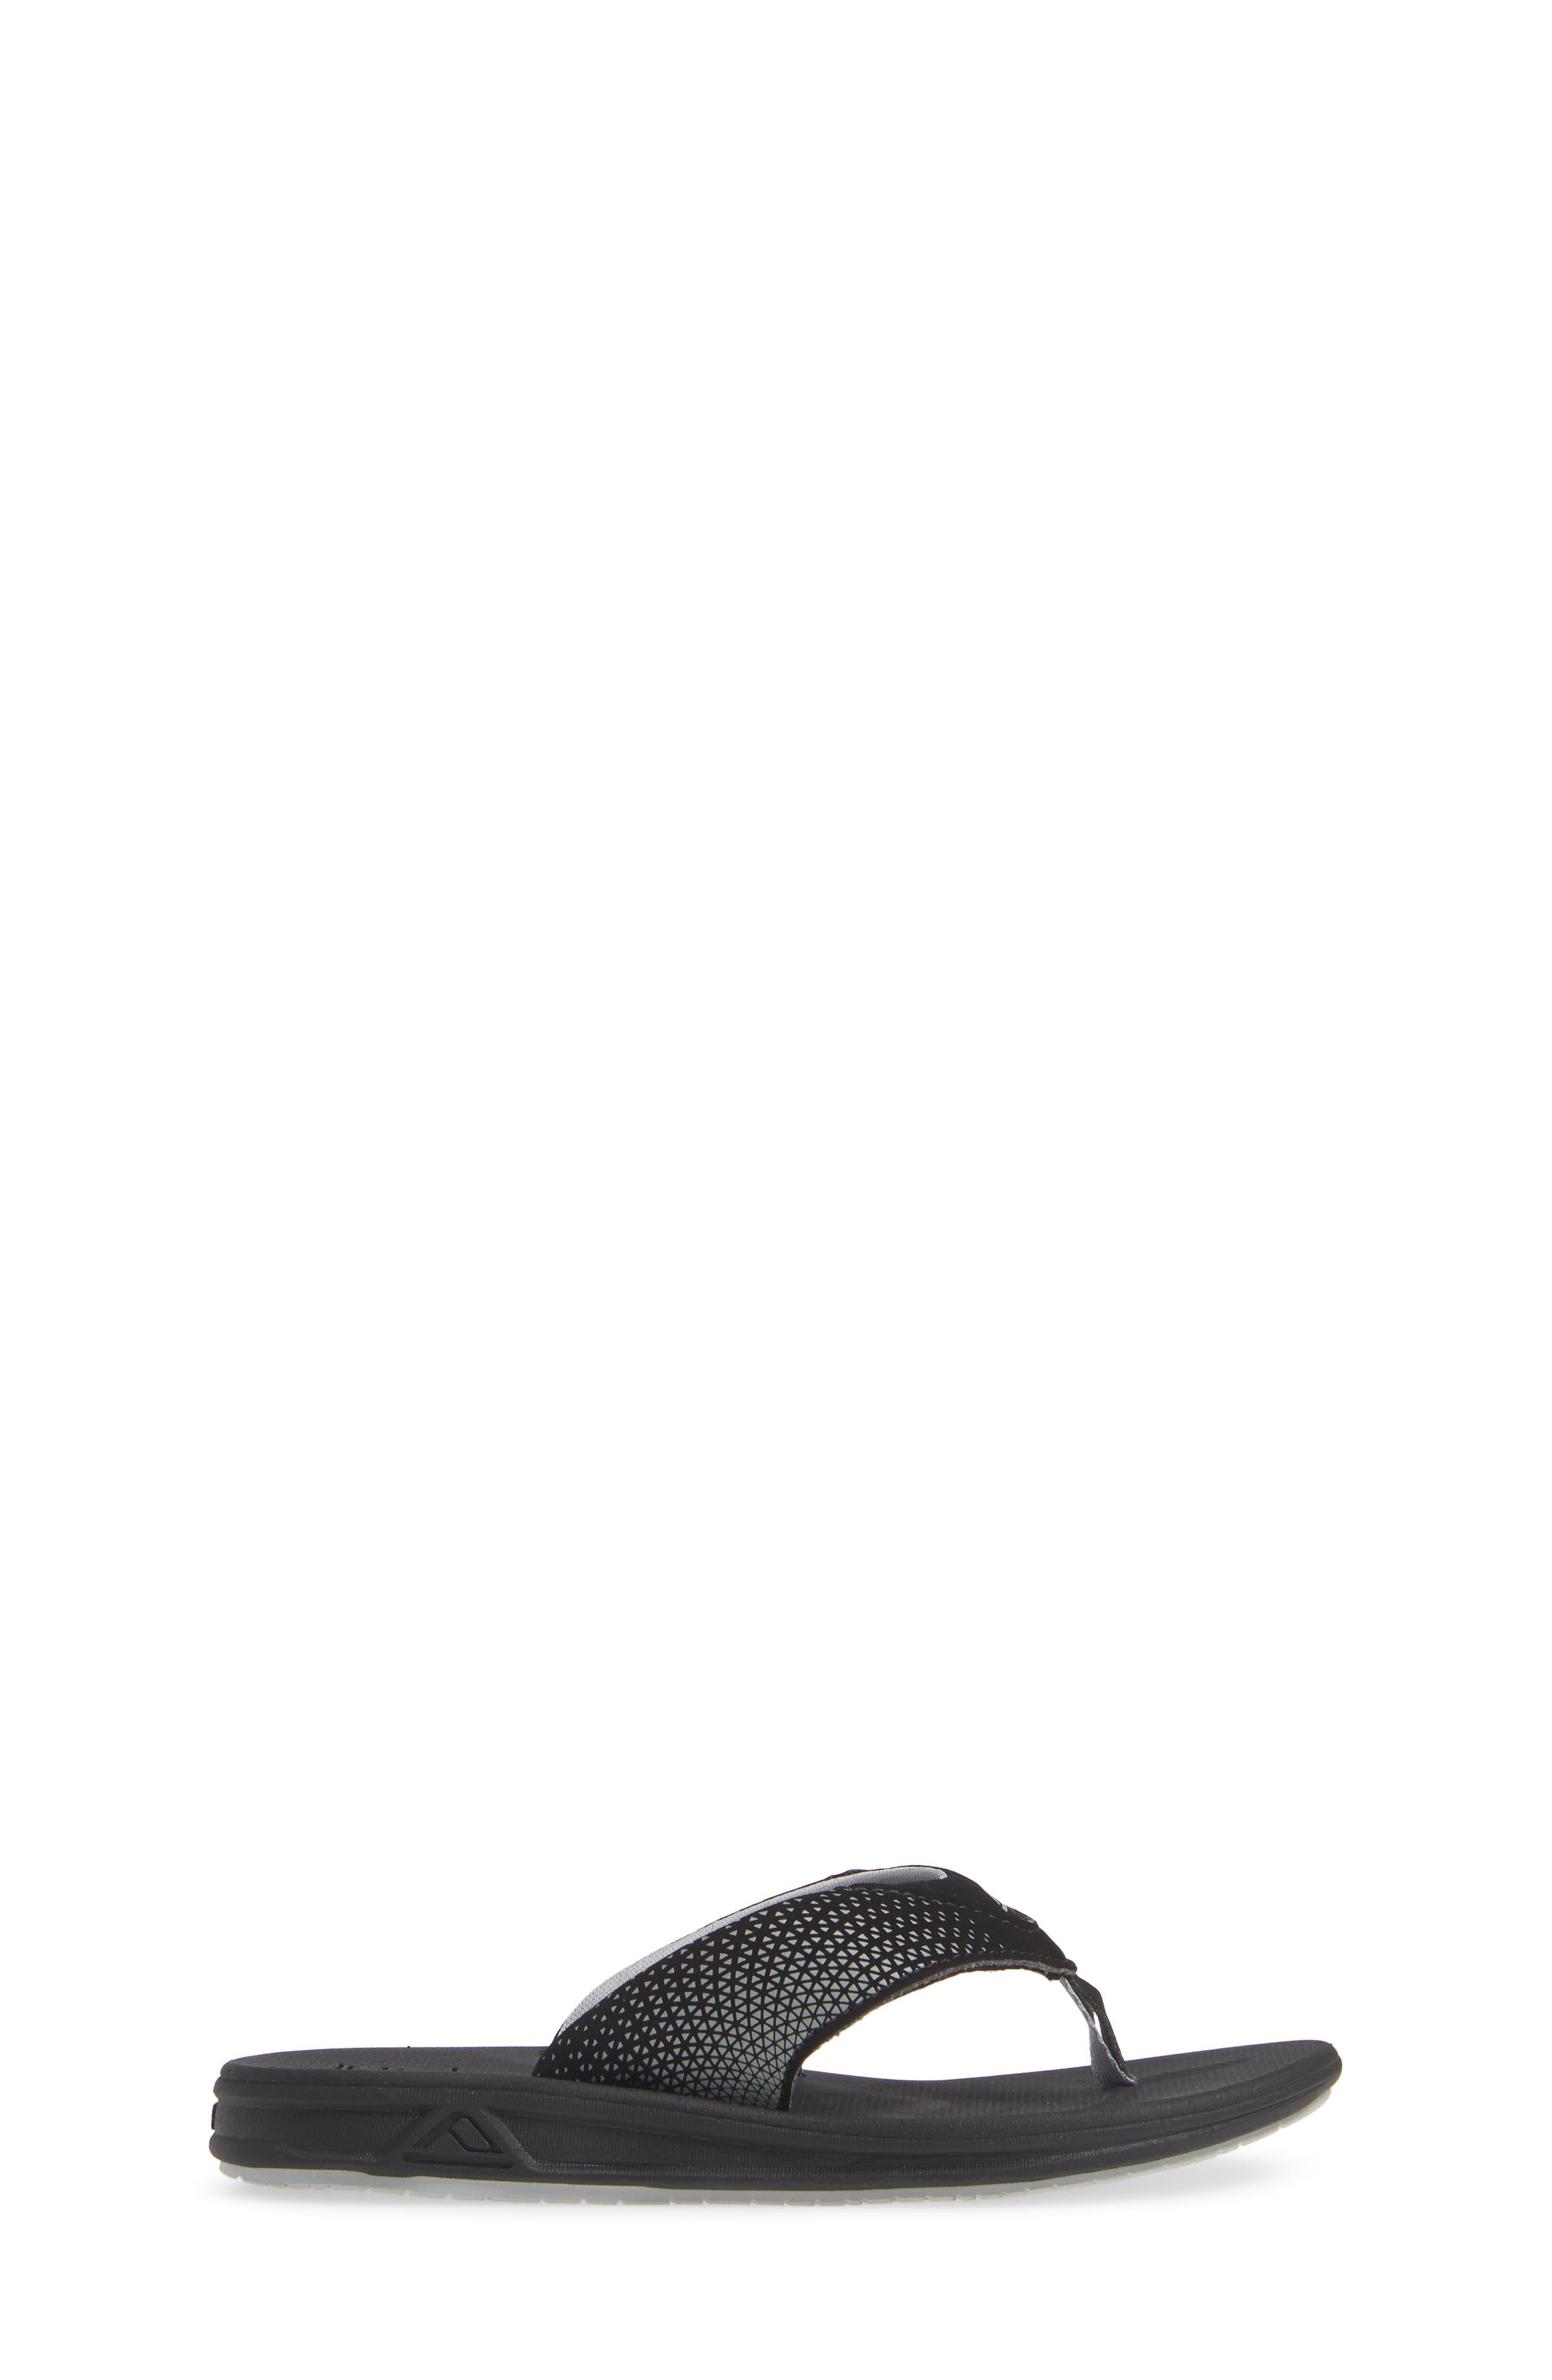 REEF, Grom Rover Water Friendly Sandal, Alternate thumbnail 3, color, BLACK